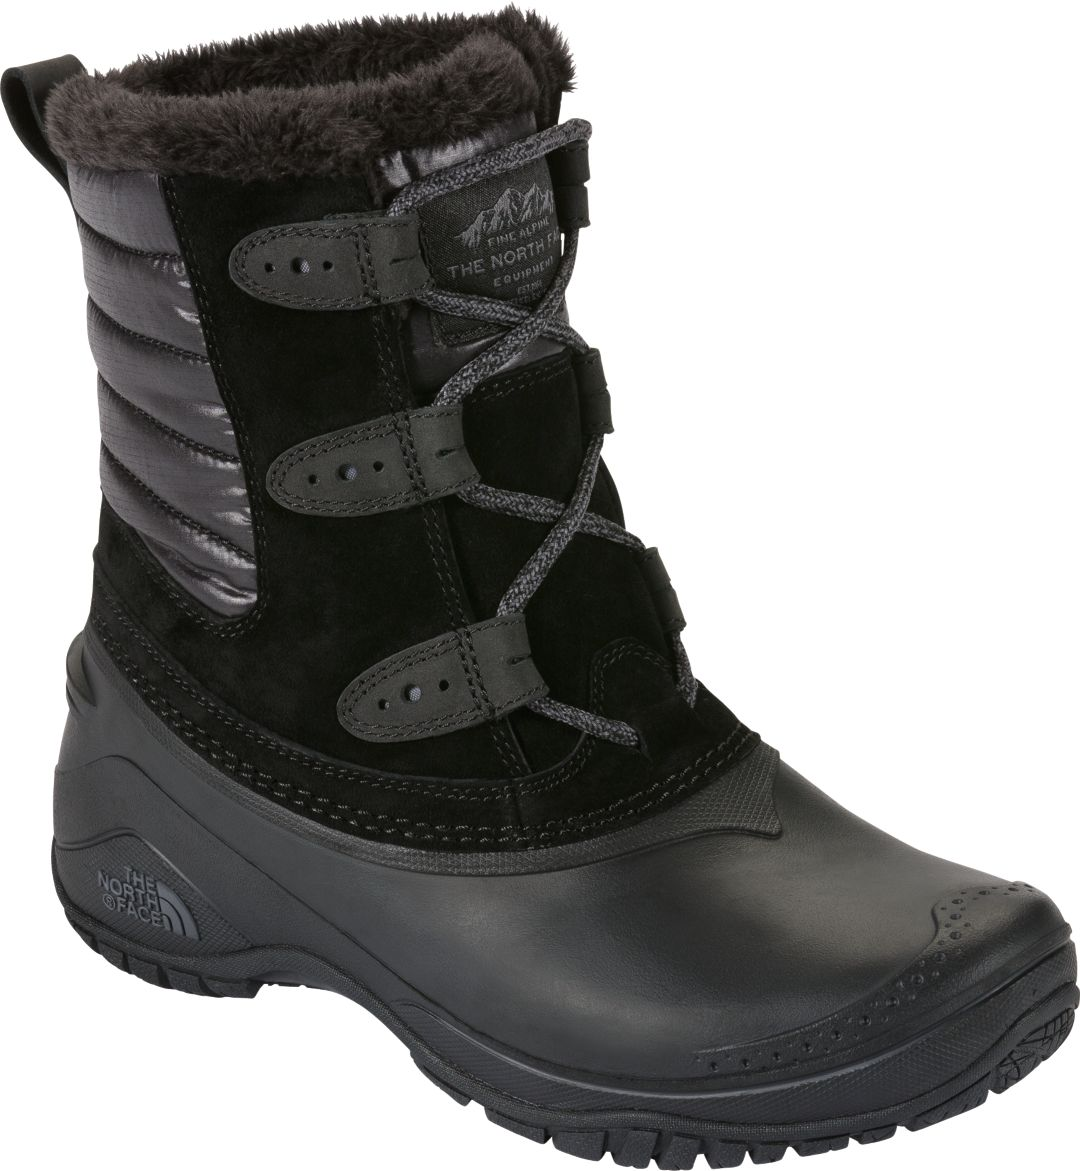 bba2d5eb3 The North Face Women's Shellista II Shorty 200g Waterproof Winter Boots